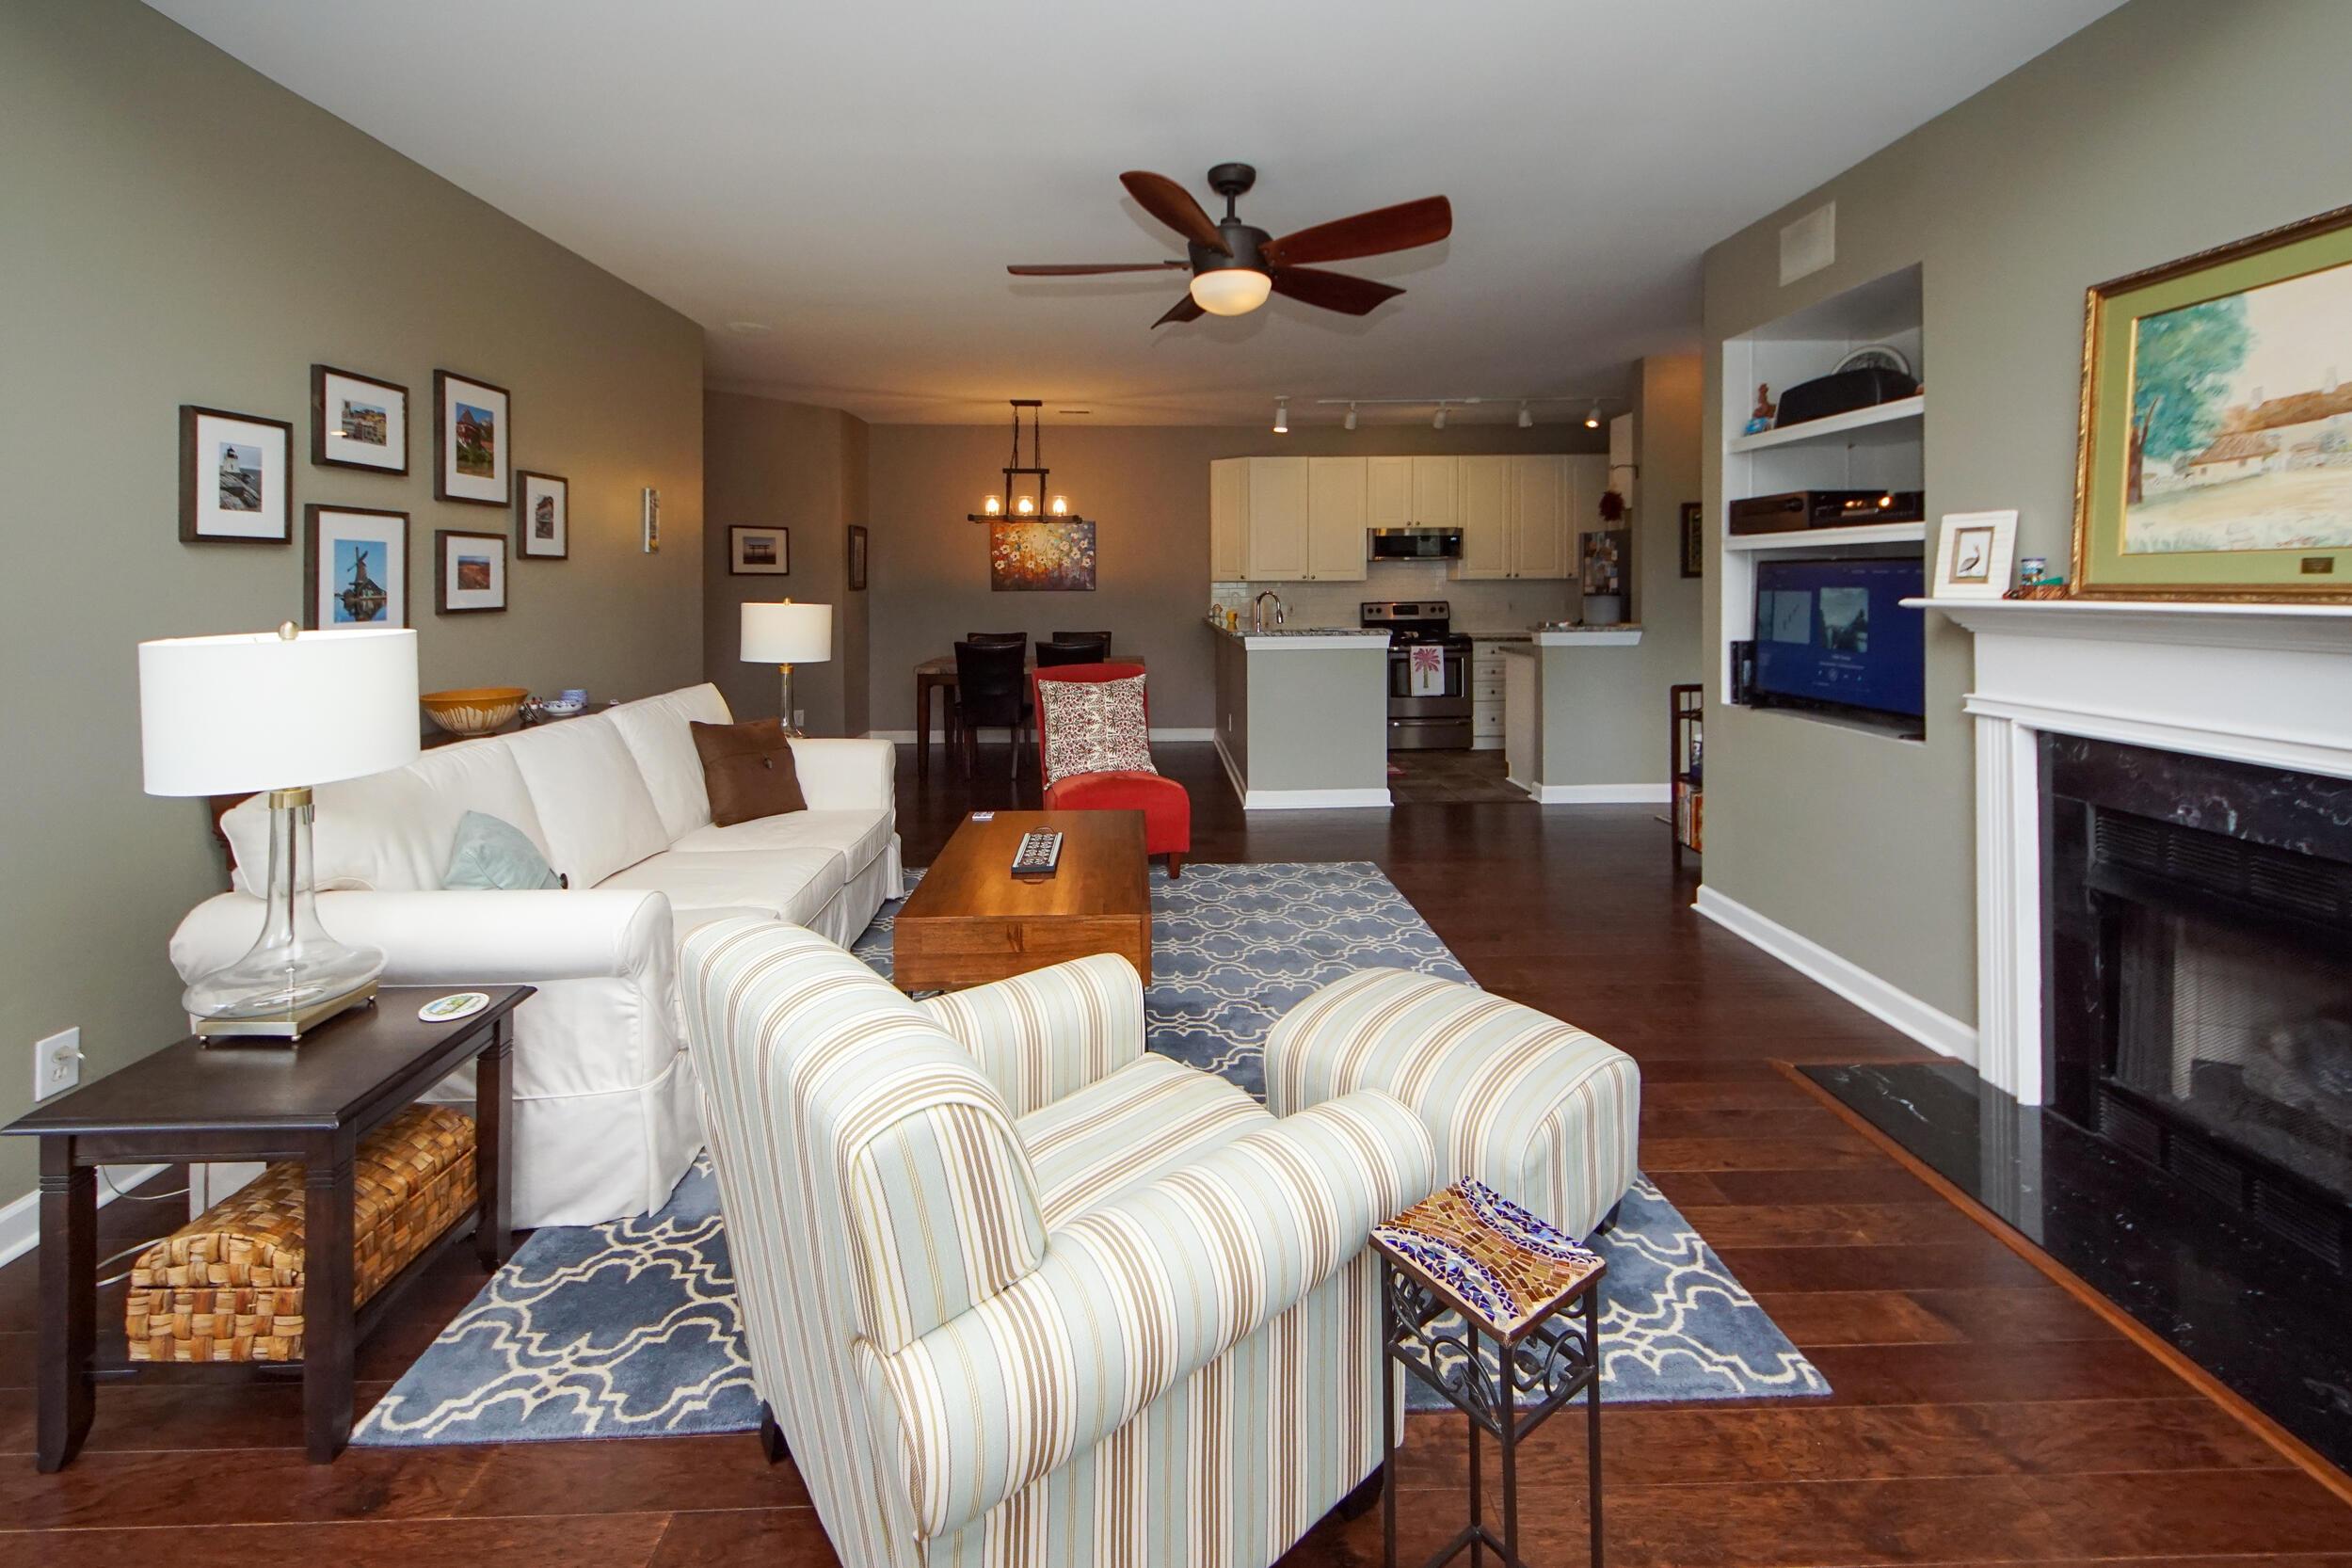 Dunes West Homes For Sale - 1631 Camfield, Mount Pleasant, SC - 6